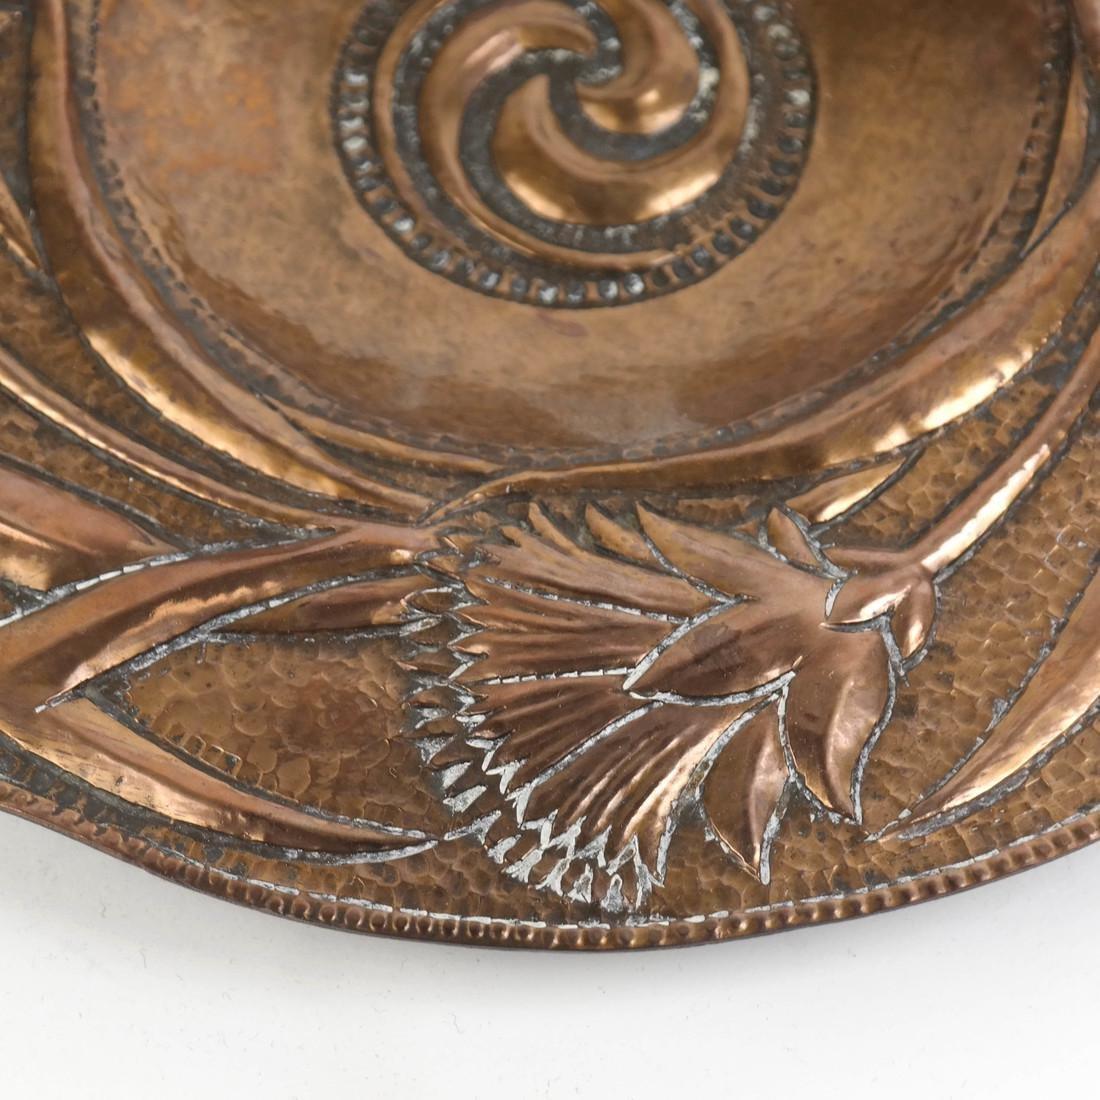 Art Nouveau Copper Plate by John Pearson - 4